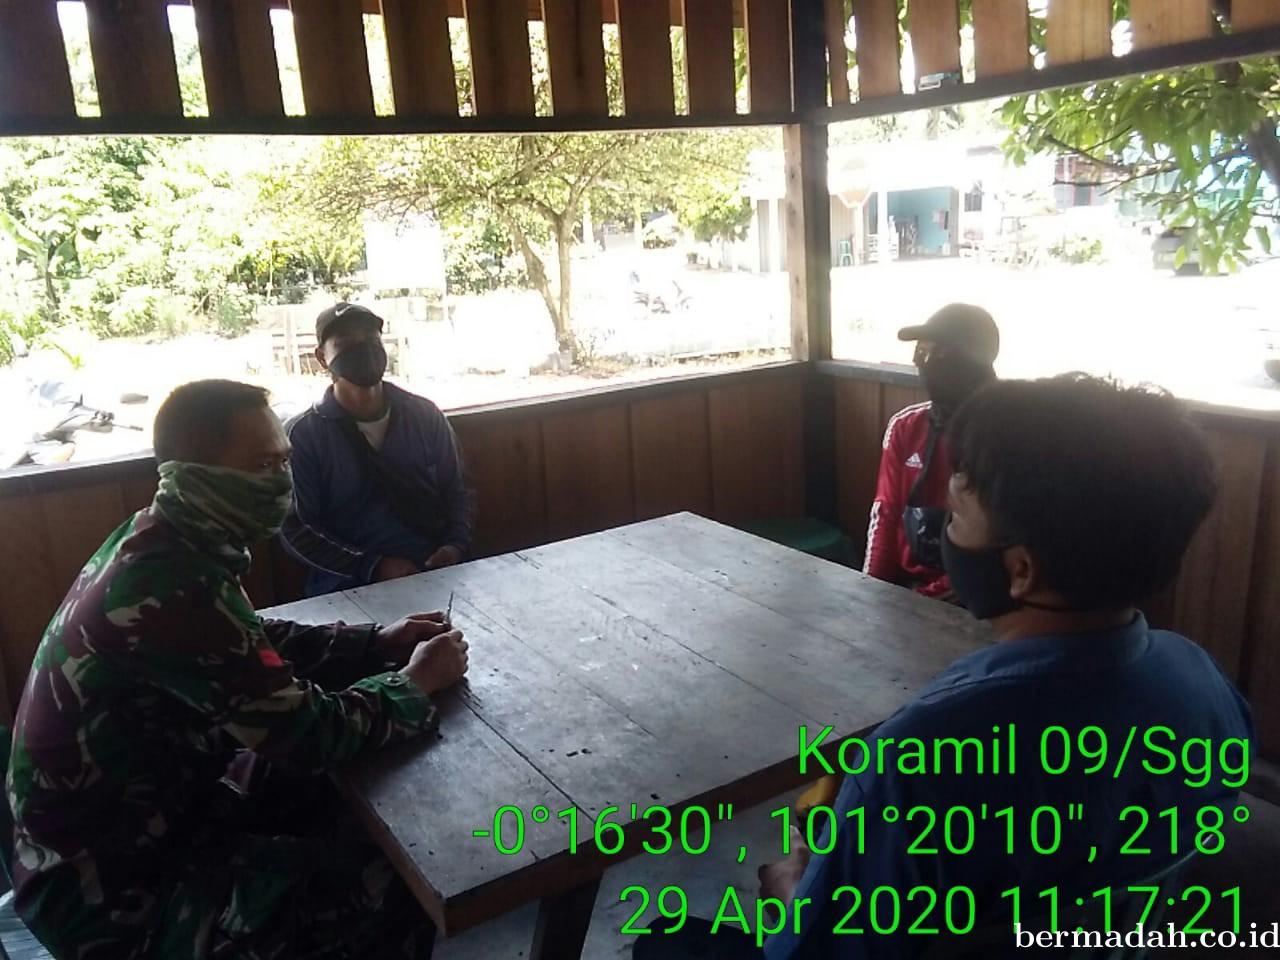 Komsos ke Desa Binaan, Babinsa Koramil 09/Singingi Ingatkan Warga Waspada Covid-19